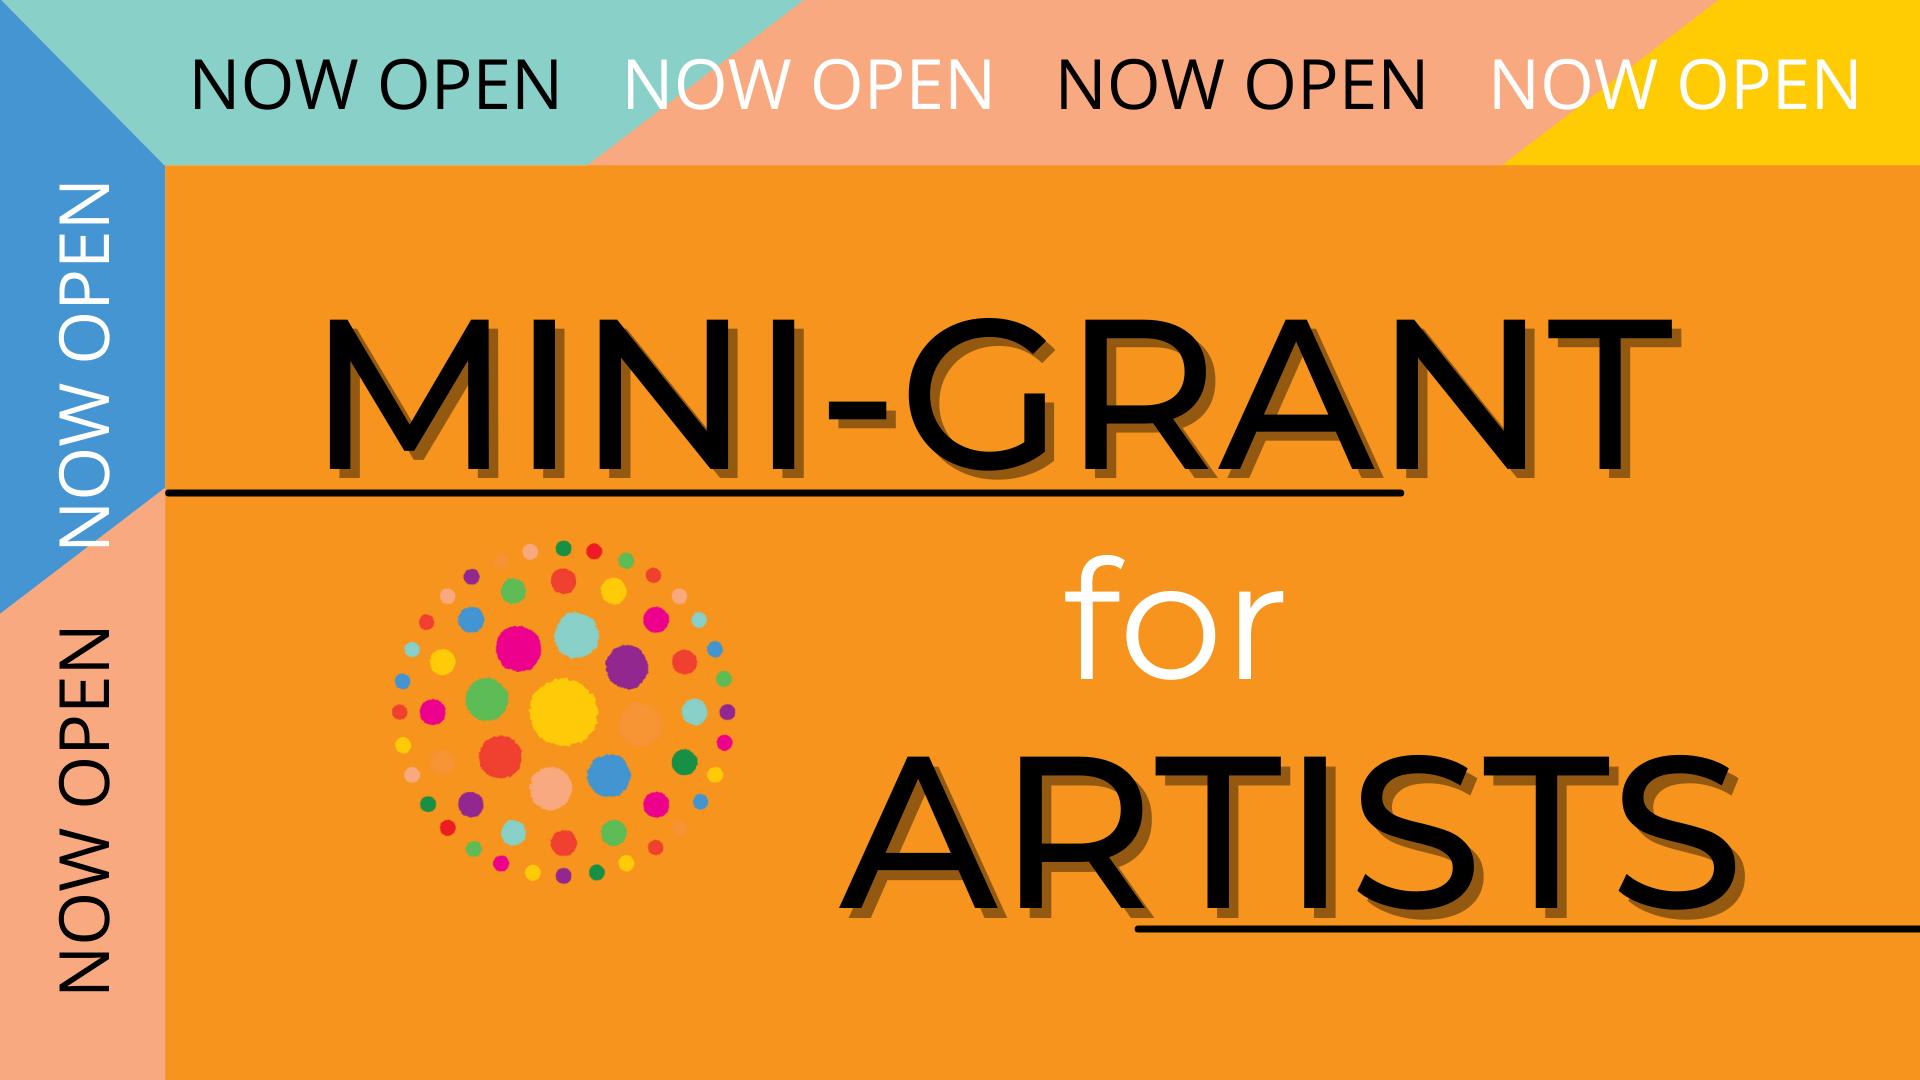 Mini Grant for Artists